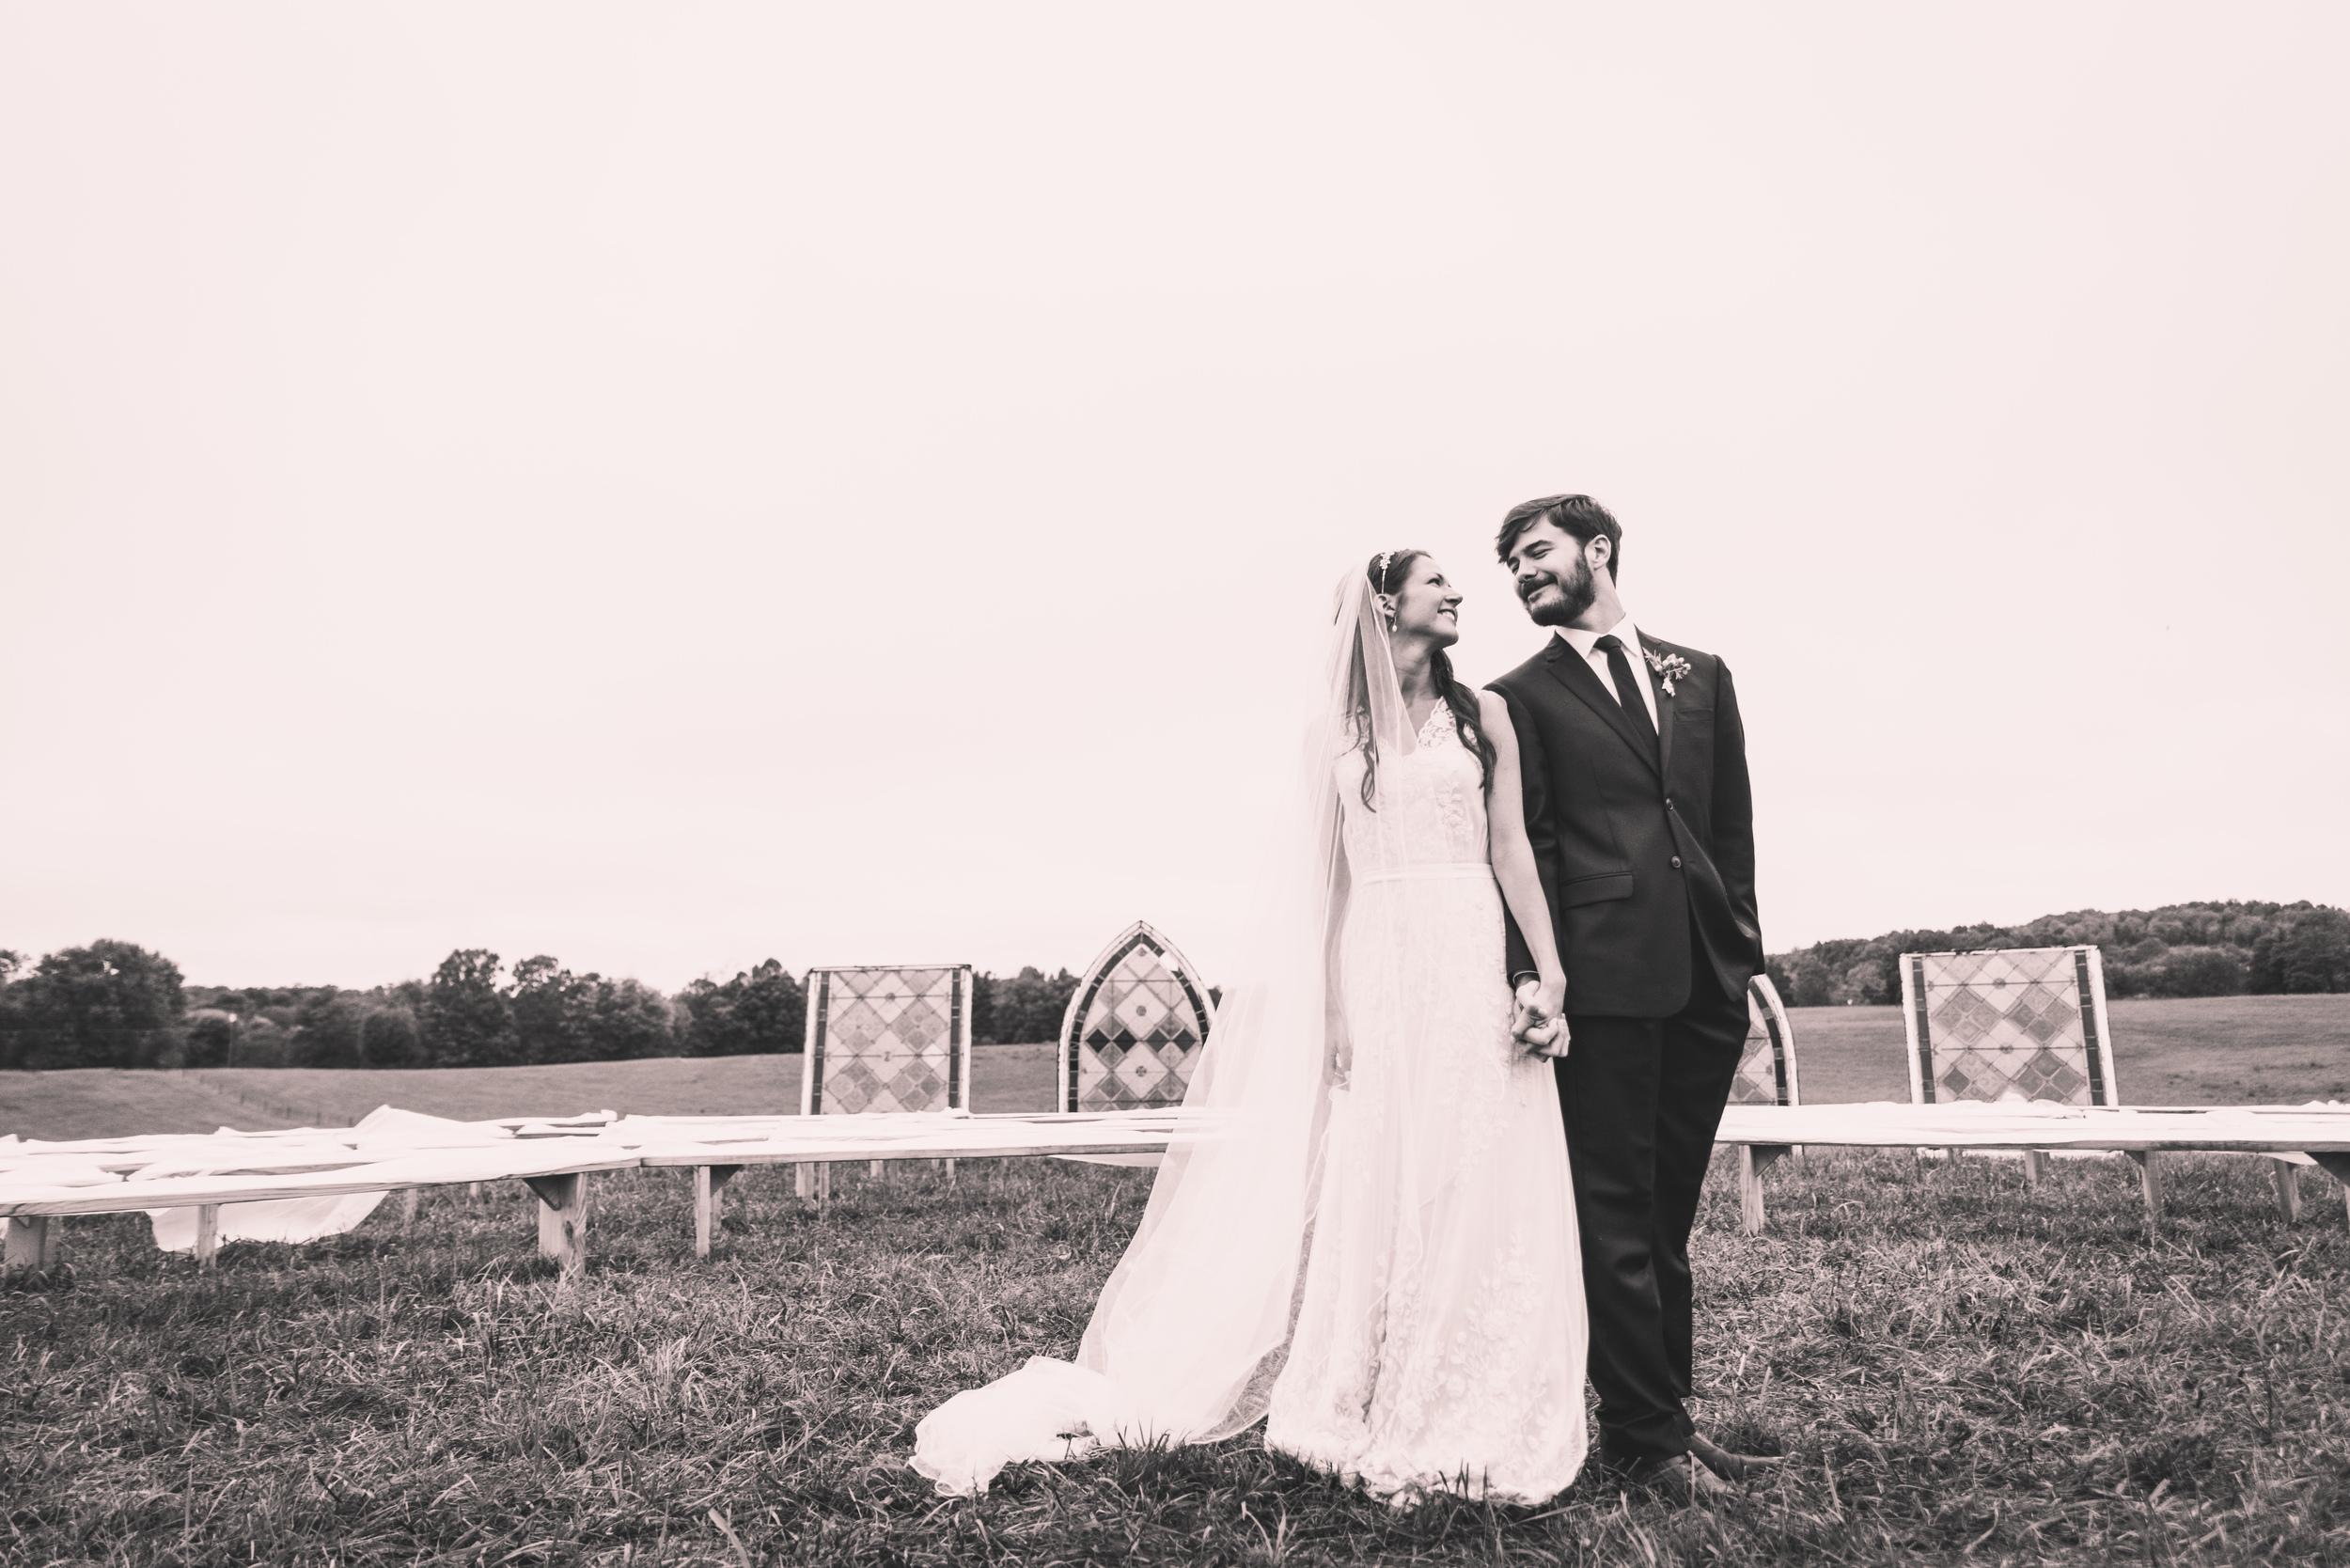 Nashville-Wedding-Photographer-John-Myers-43.jpg